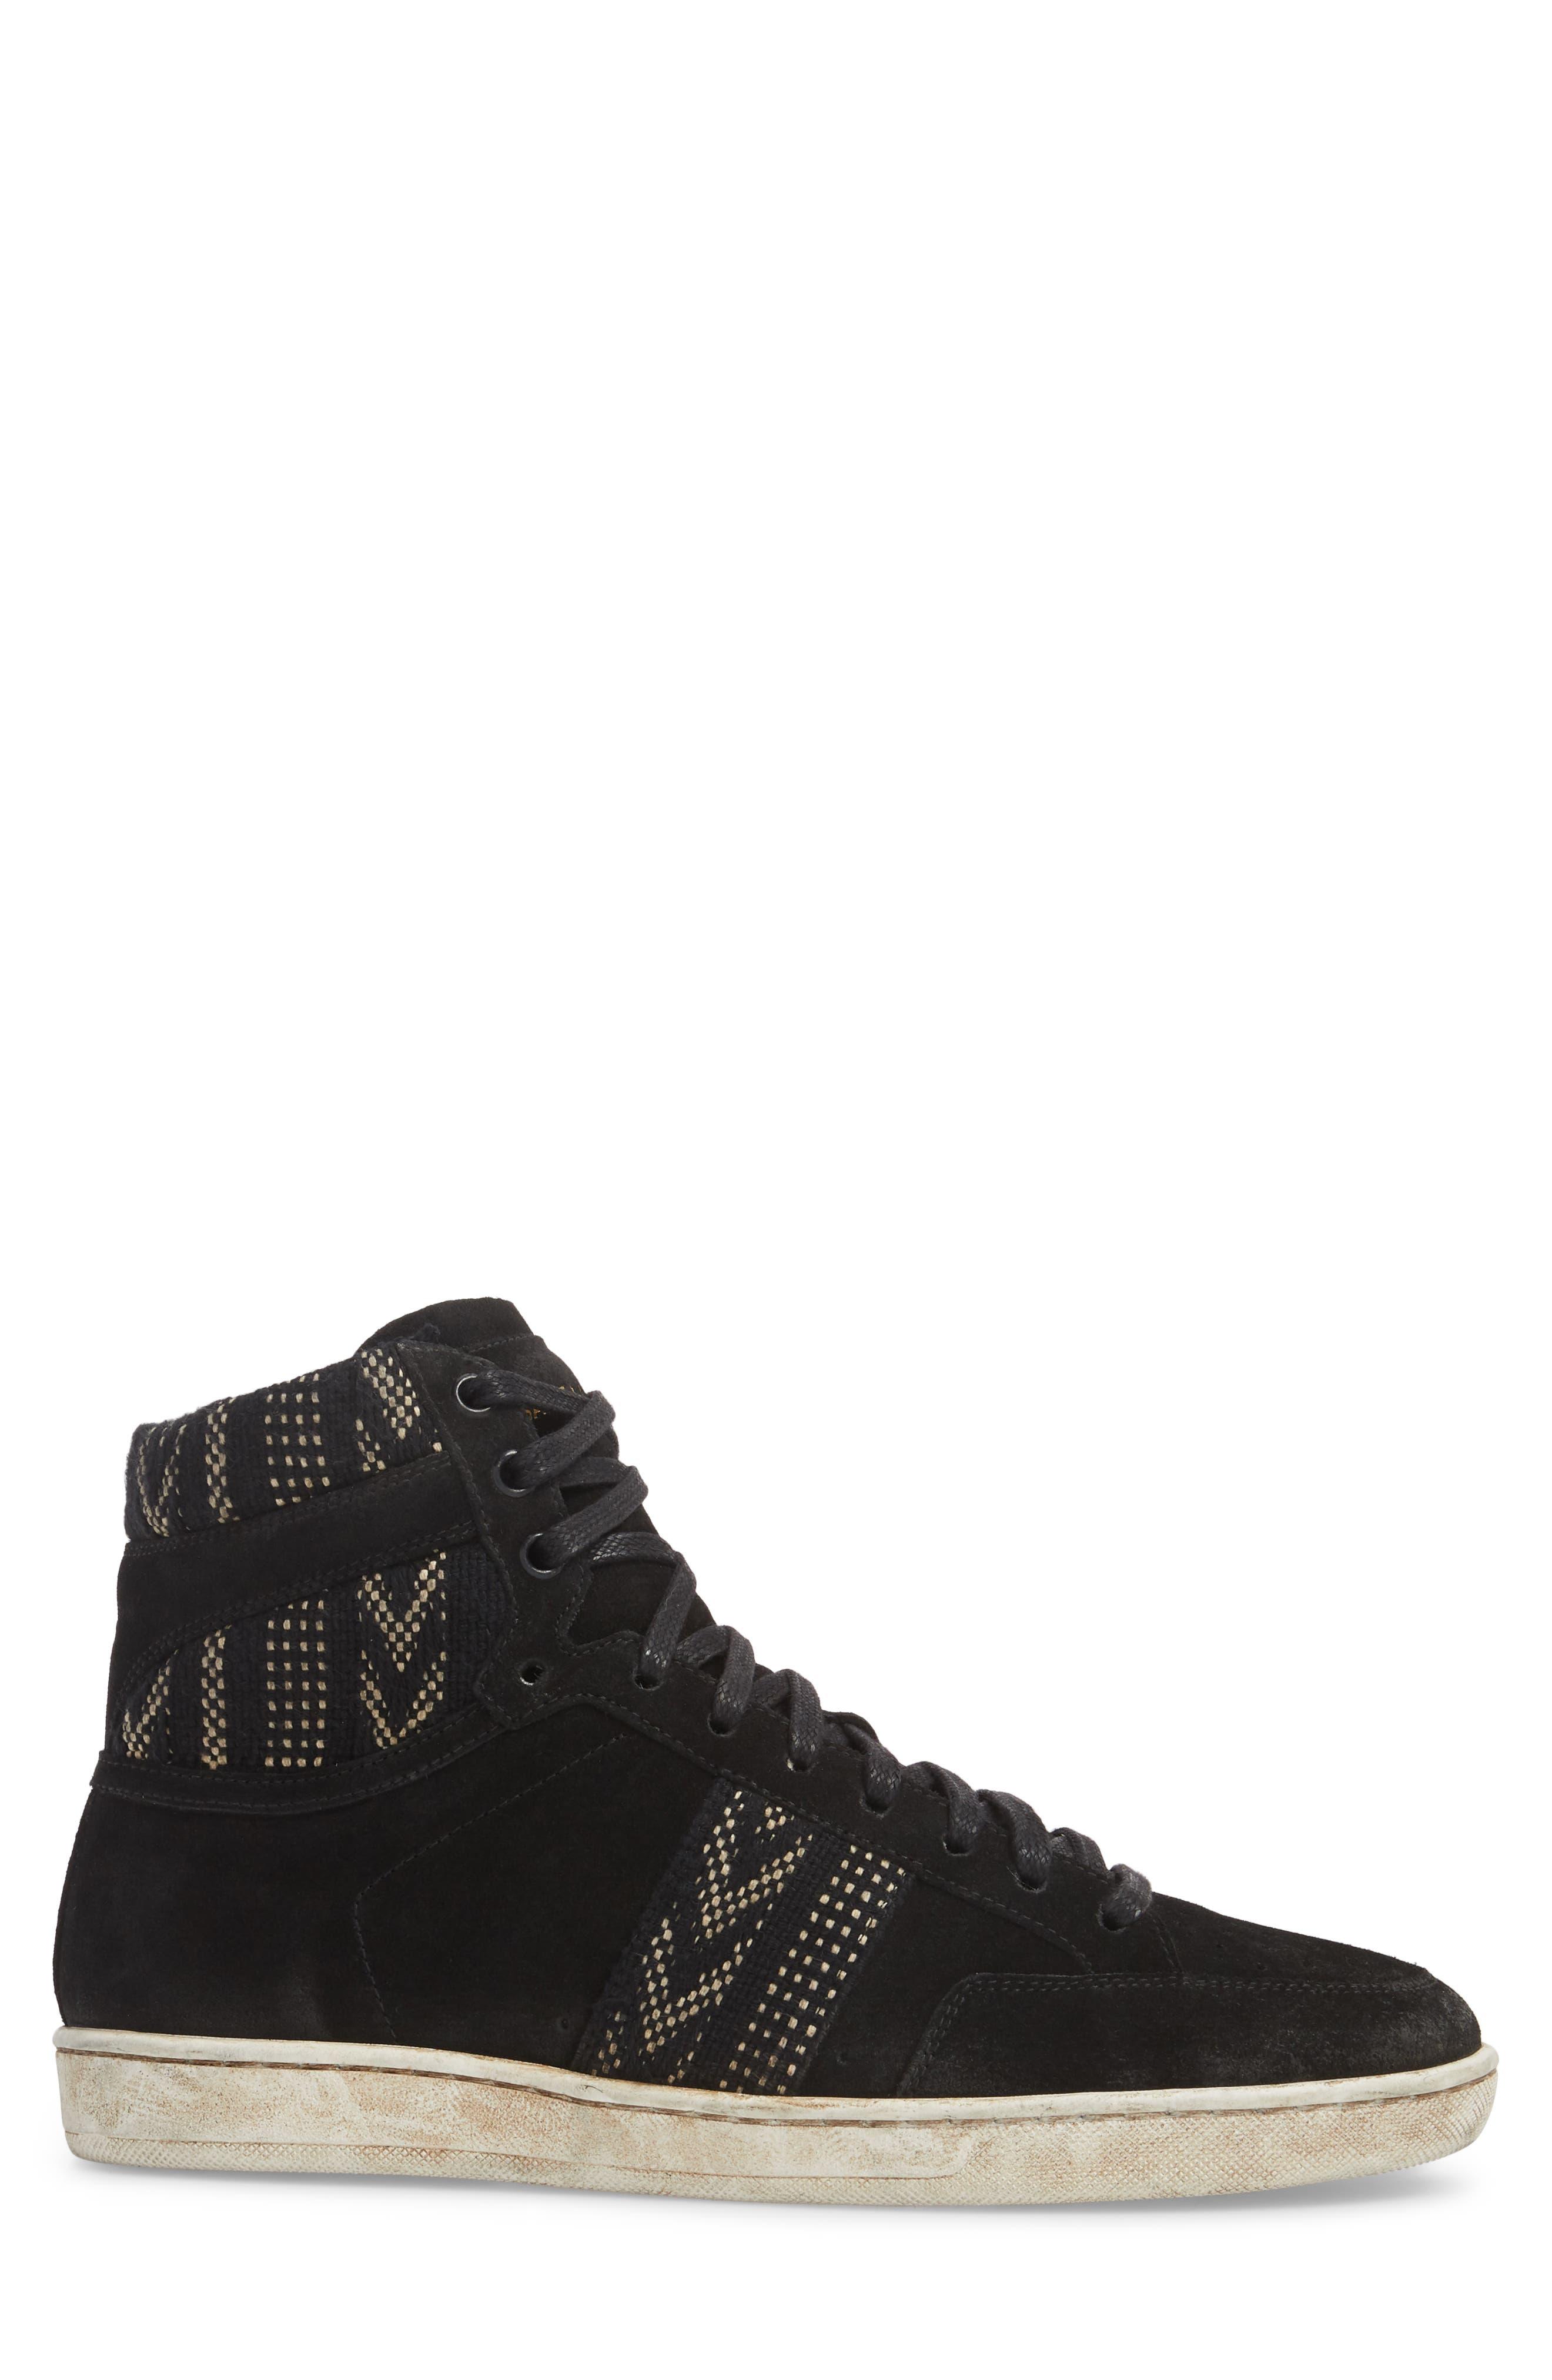 High Top Sneaker,                             Alternate thumbnail 3, color,